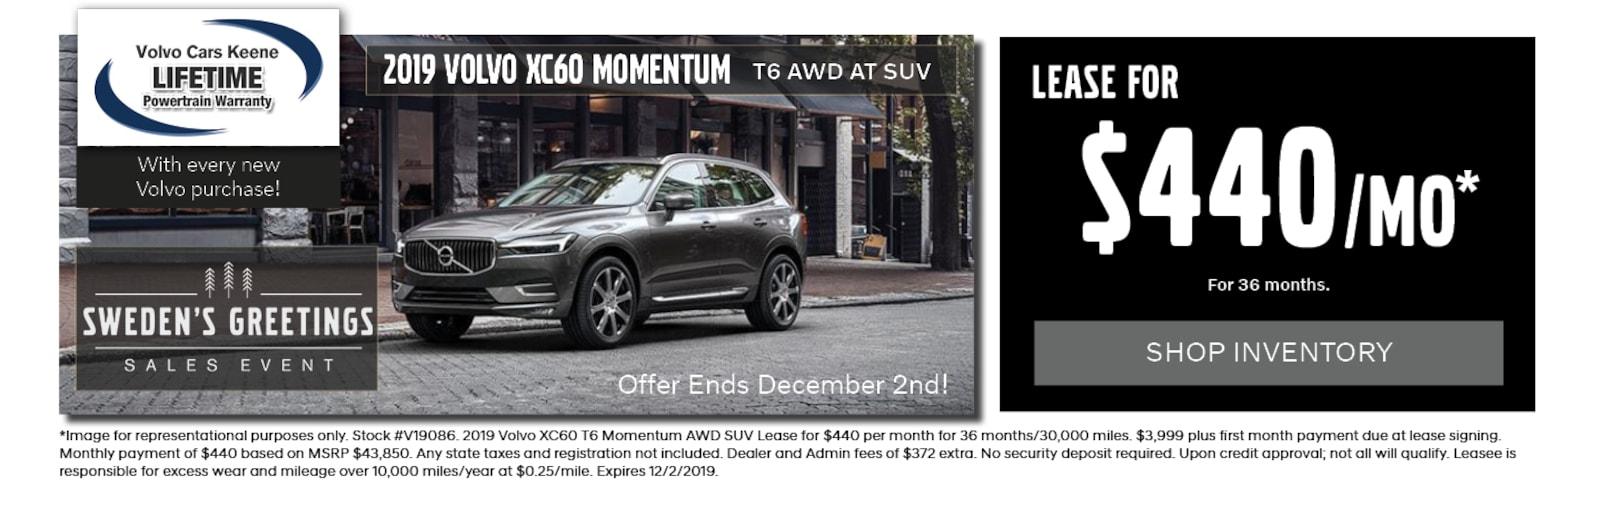 Volvo Dealers Nh >> Volvo Cars Keene East Swanzey Nh New Used Volvo